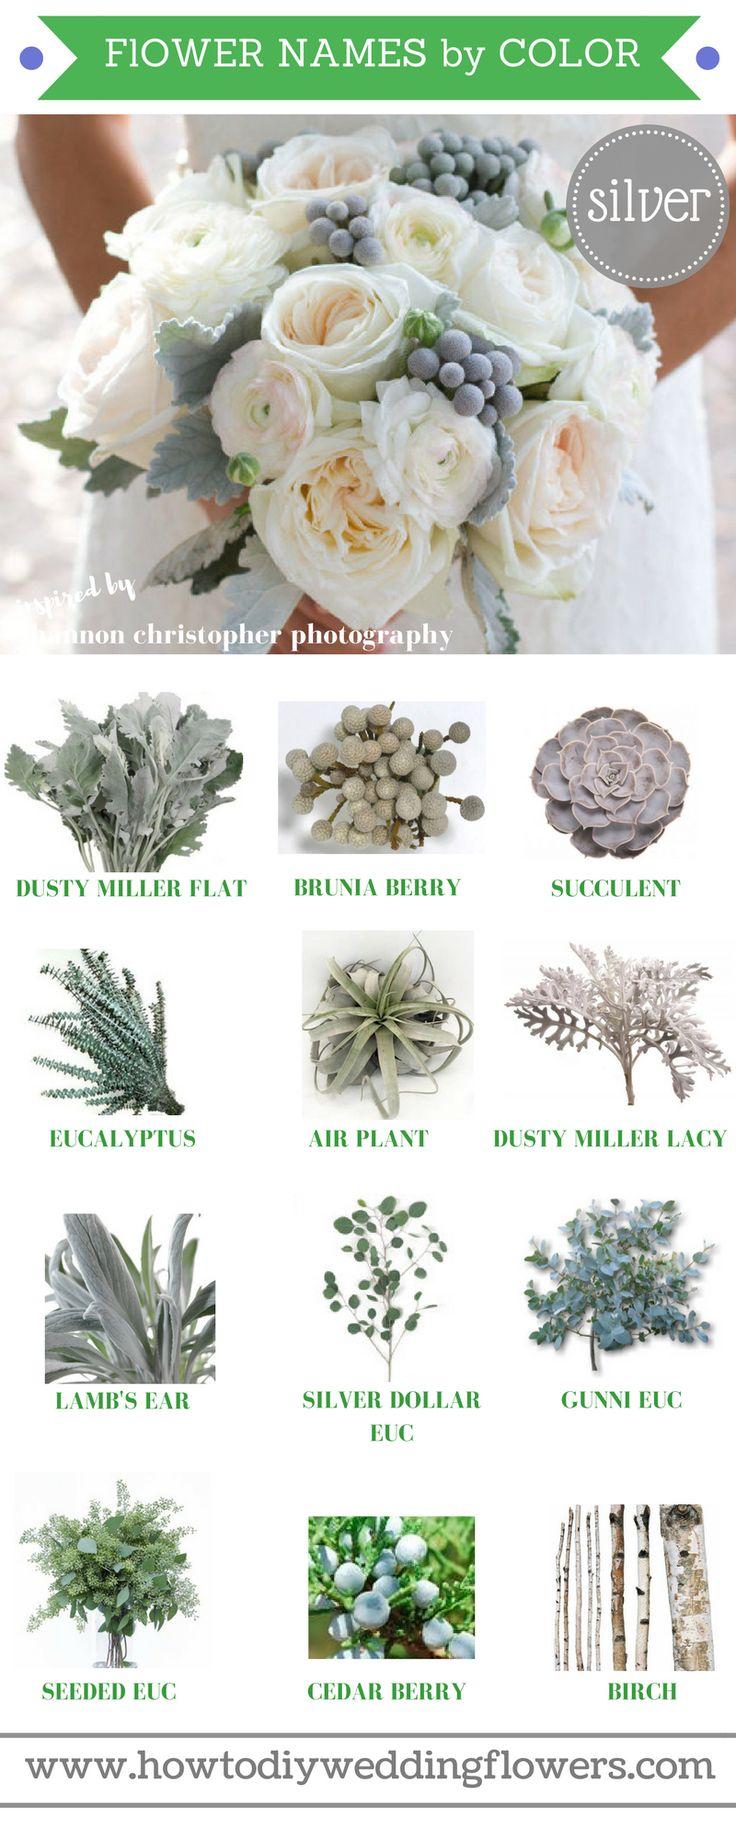 Wedding Trends 2018 ! How To DIY Wedding Flowers! Silver Grey 2018 Wedding Flower Trends. Easy DIY Tutorials and How to Tips & Tricks! #diywedding #diyflowers #howtomakeabouquet www.howtodiyweddingflowers.com